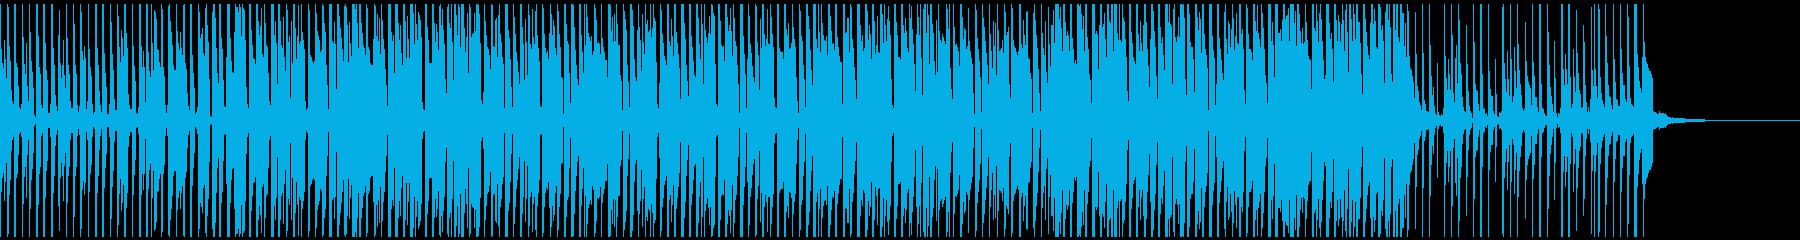 Positive Pop Reggaeの再生済みの波形